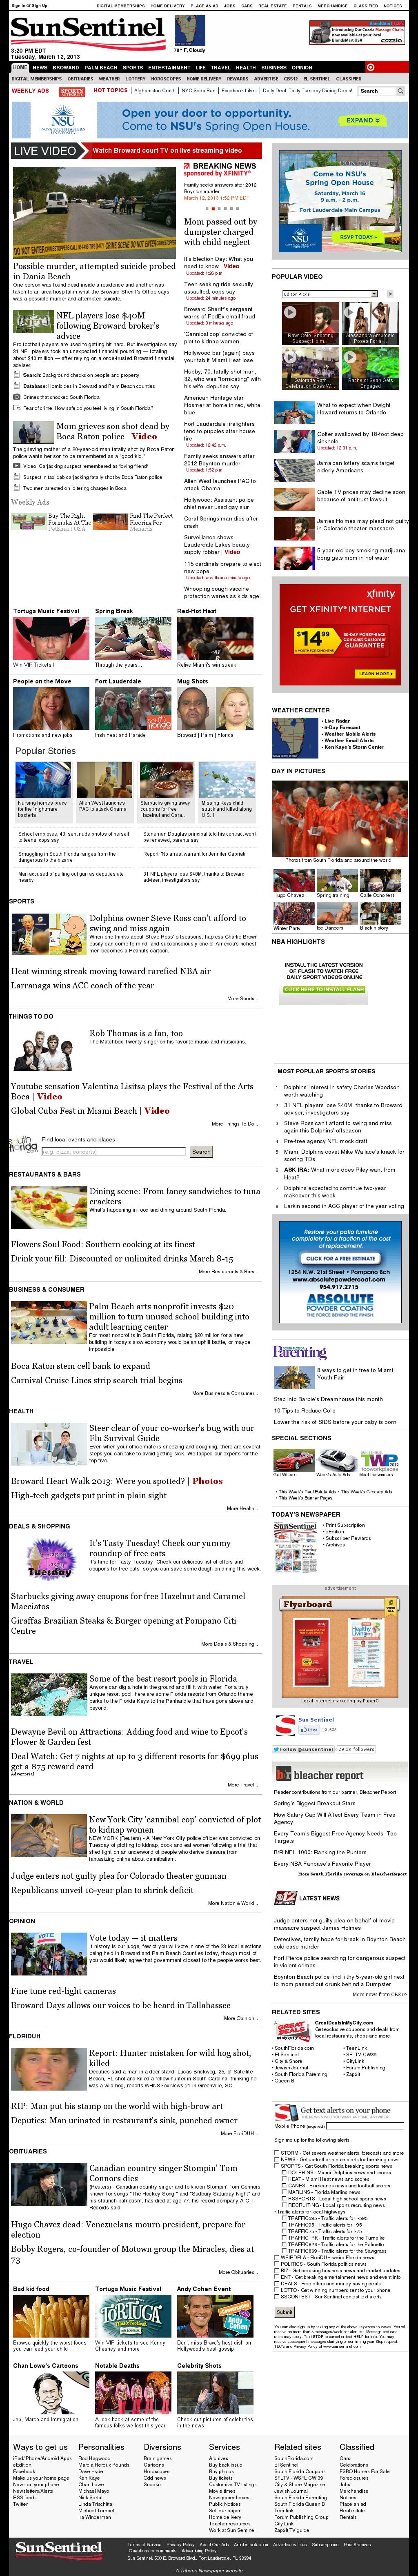 (Florida) Sun Sentinel at Tuesday March 12, 2013, 7:21 p.m. UTC